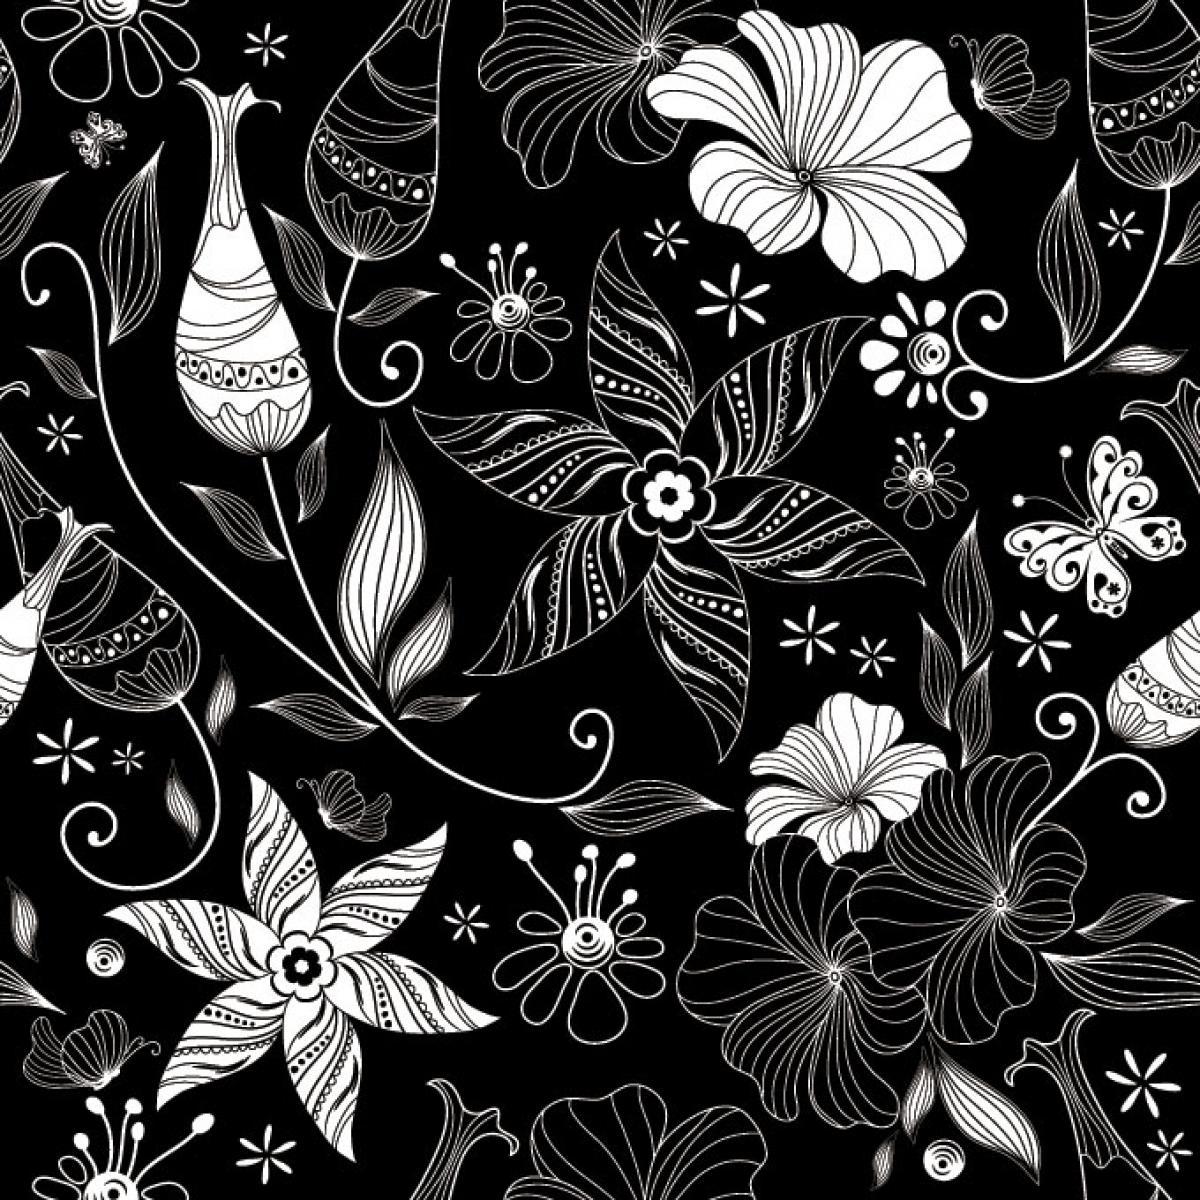 Floral Pattern Wallpaper #331656